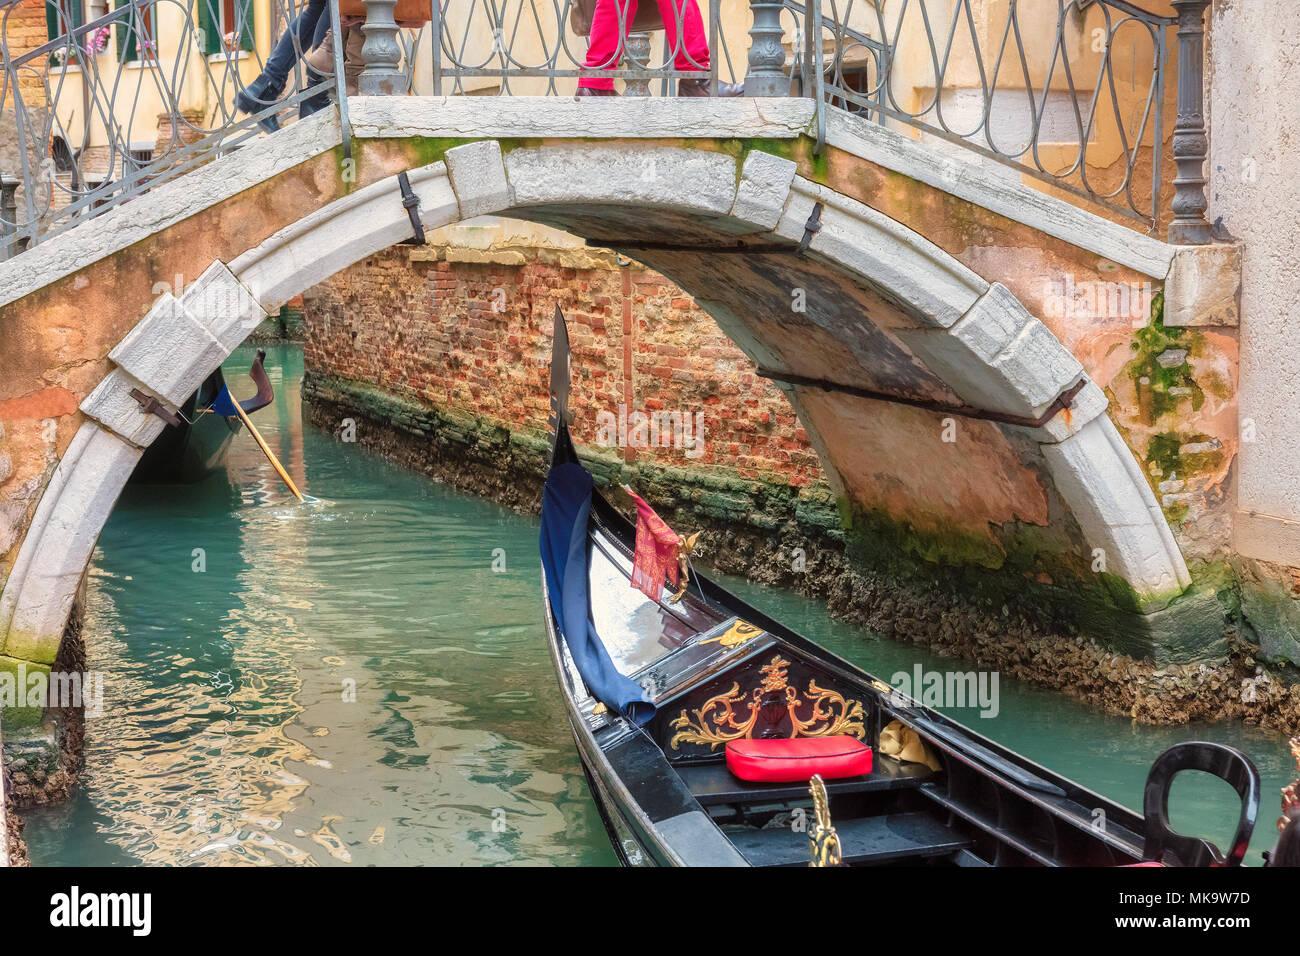 Venetian canal with gondola in Venice, Italy. - Stock Image